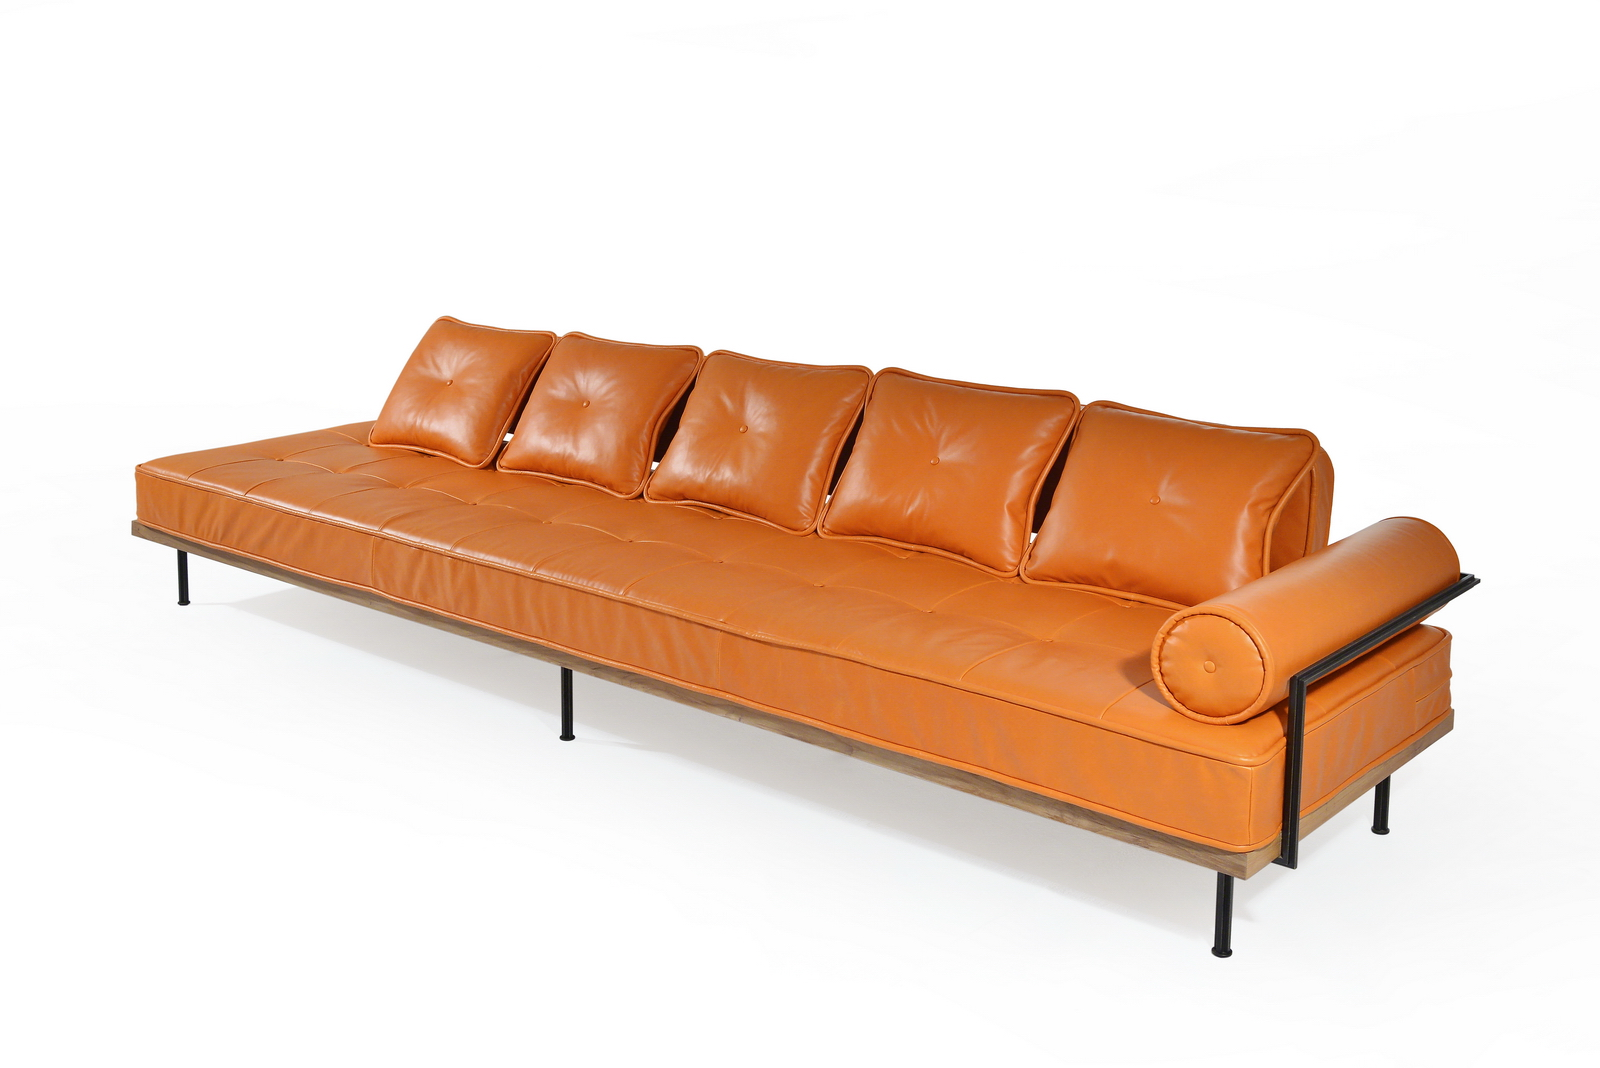 PTendercool-Sofa Corner-BS3-TE-BL-NO-Leather-210623-08